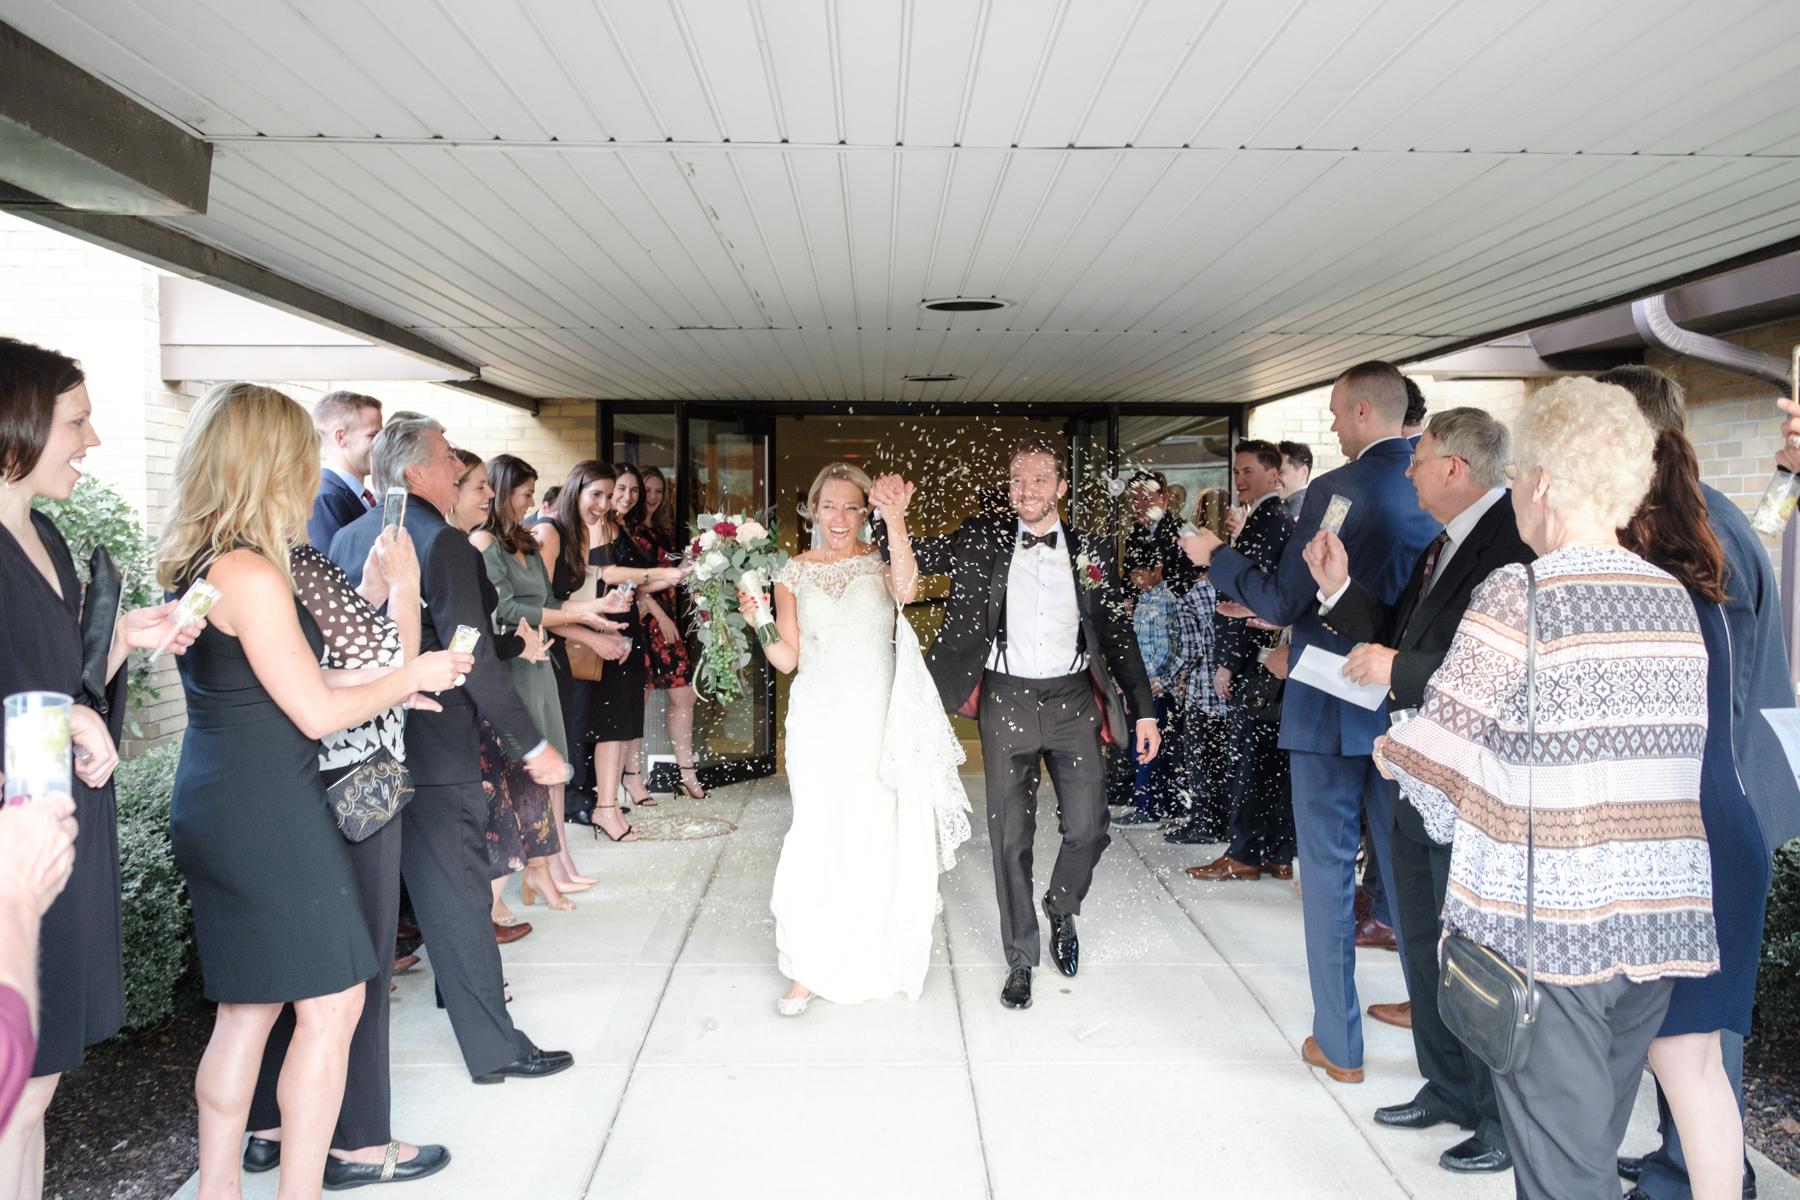 2017_BAP_KalliMatt_Gleneagles_CountryClub_Lemont_Wedding-50.jpg